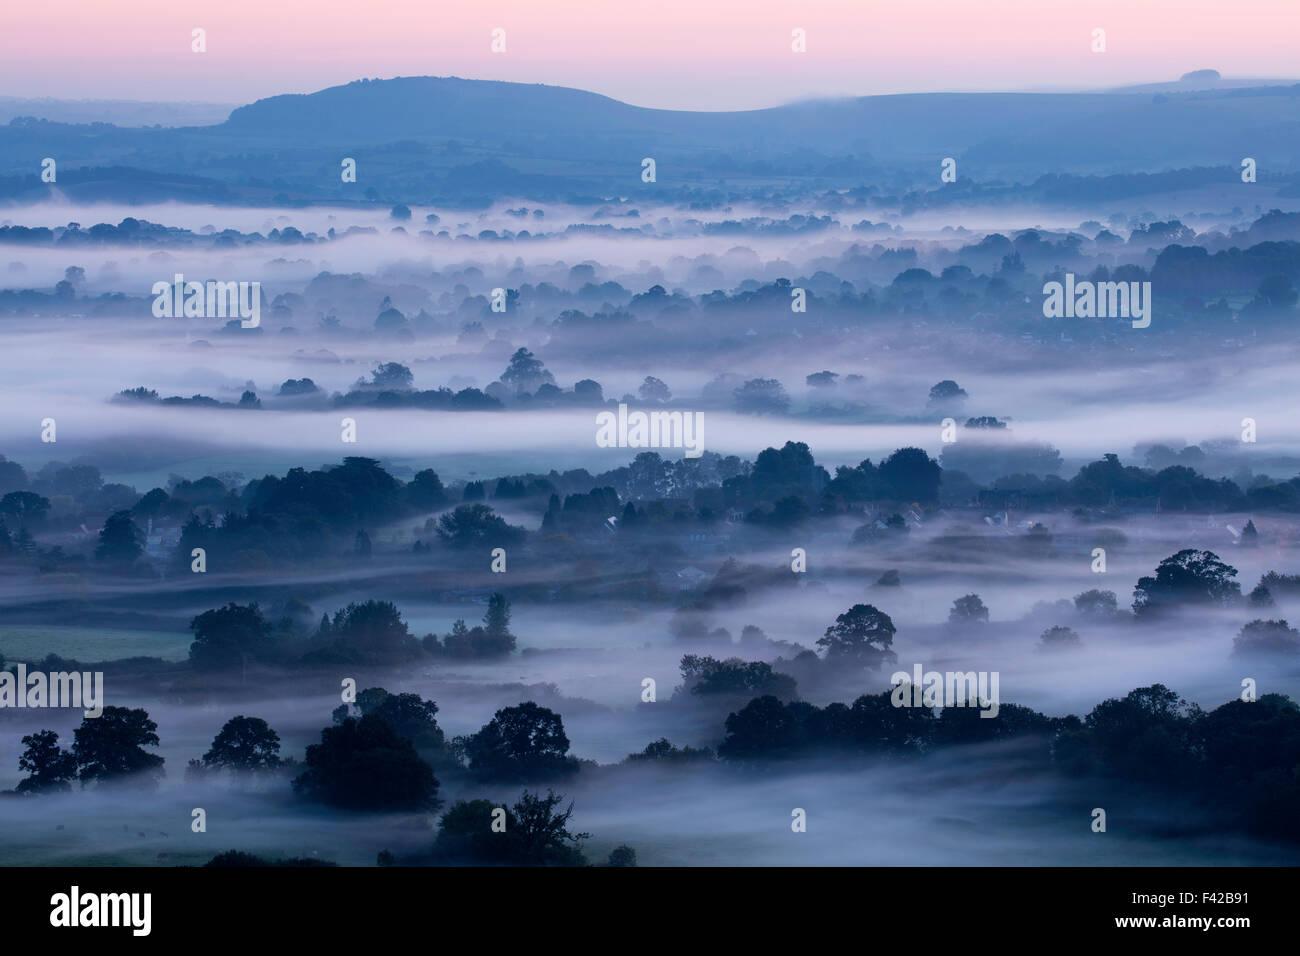 Un matin brumeux dans la vallée de Blackmore, Dorset, England, UK Photo Stock